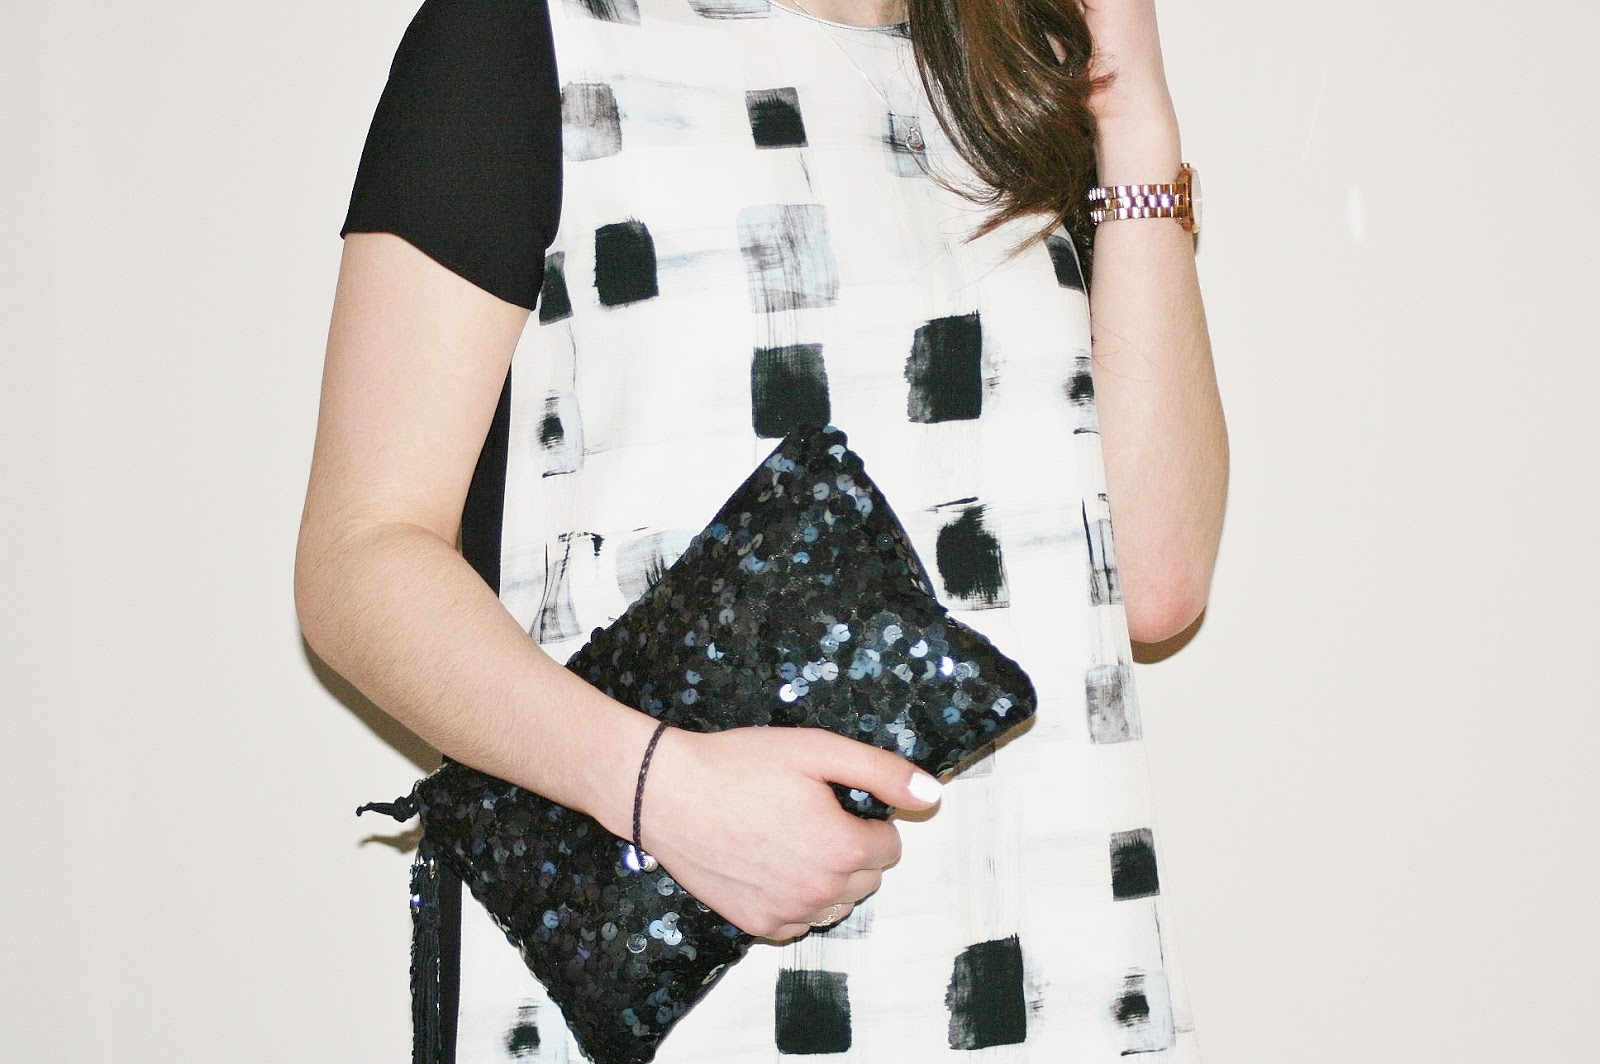 Katherine Penney Chic Fashion Style Outfit Evening Smart Zara Favourite Top Fancy Navy Black Prints